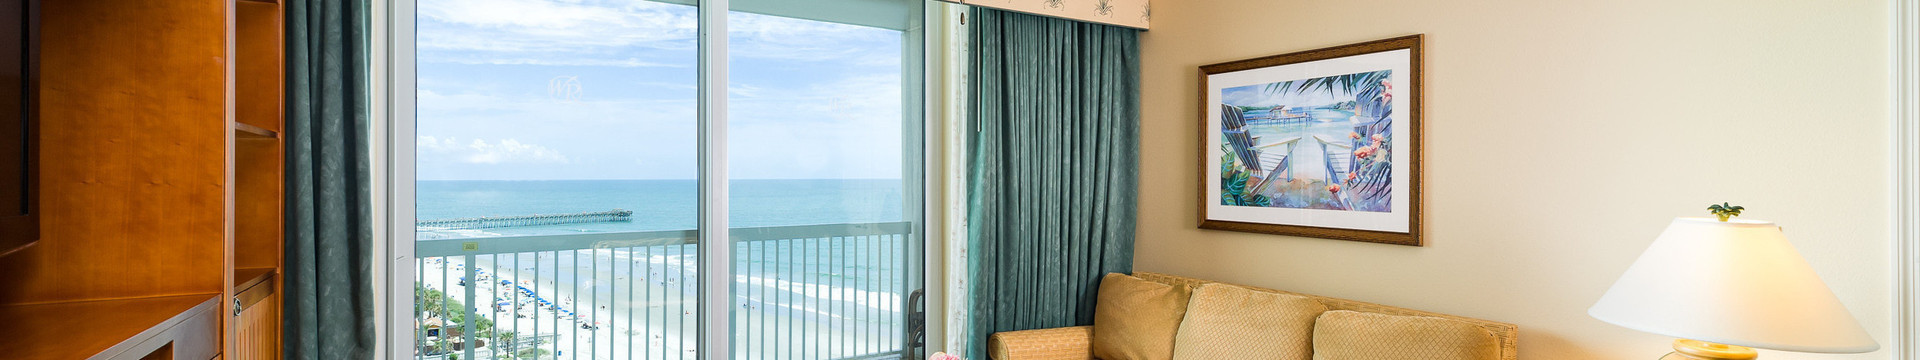 Does Westgate Myrtle Beach Resort offer ocean view rooms?